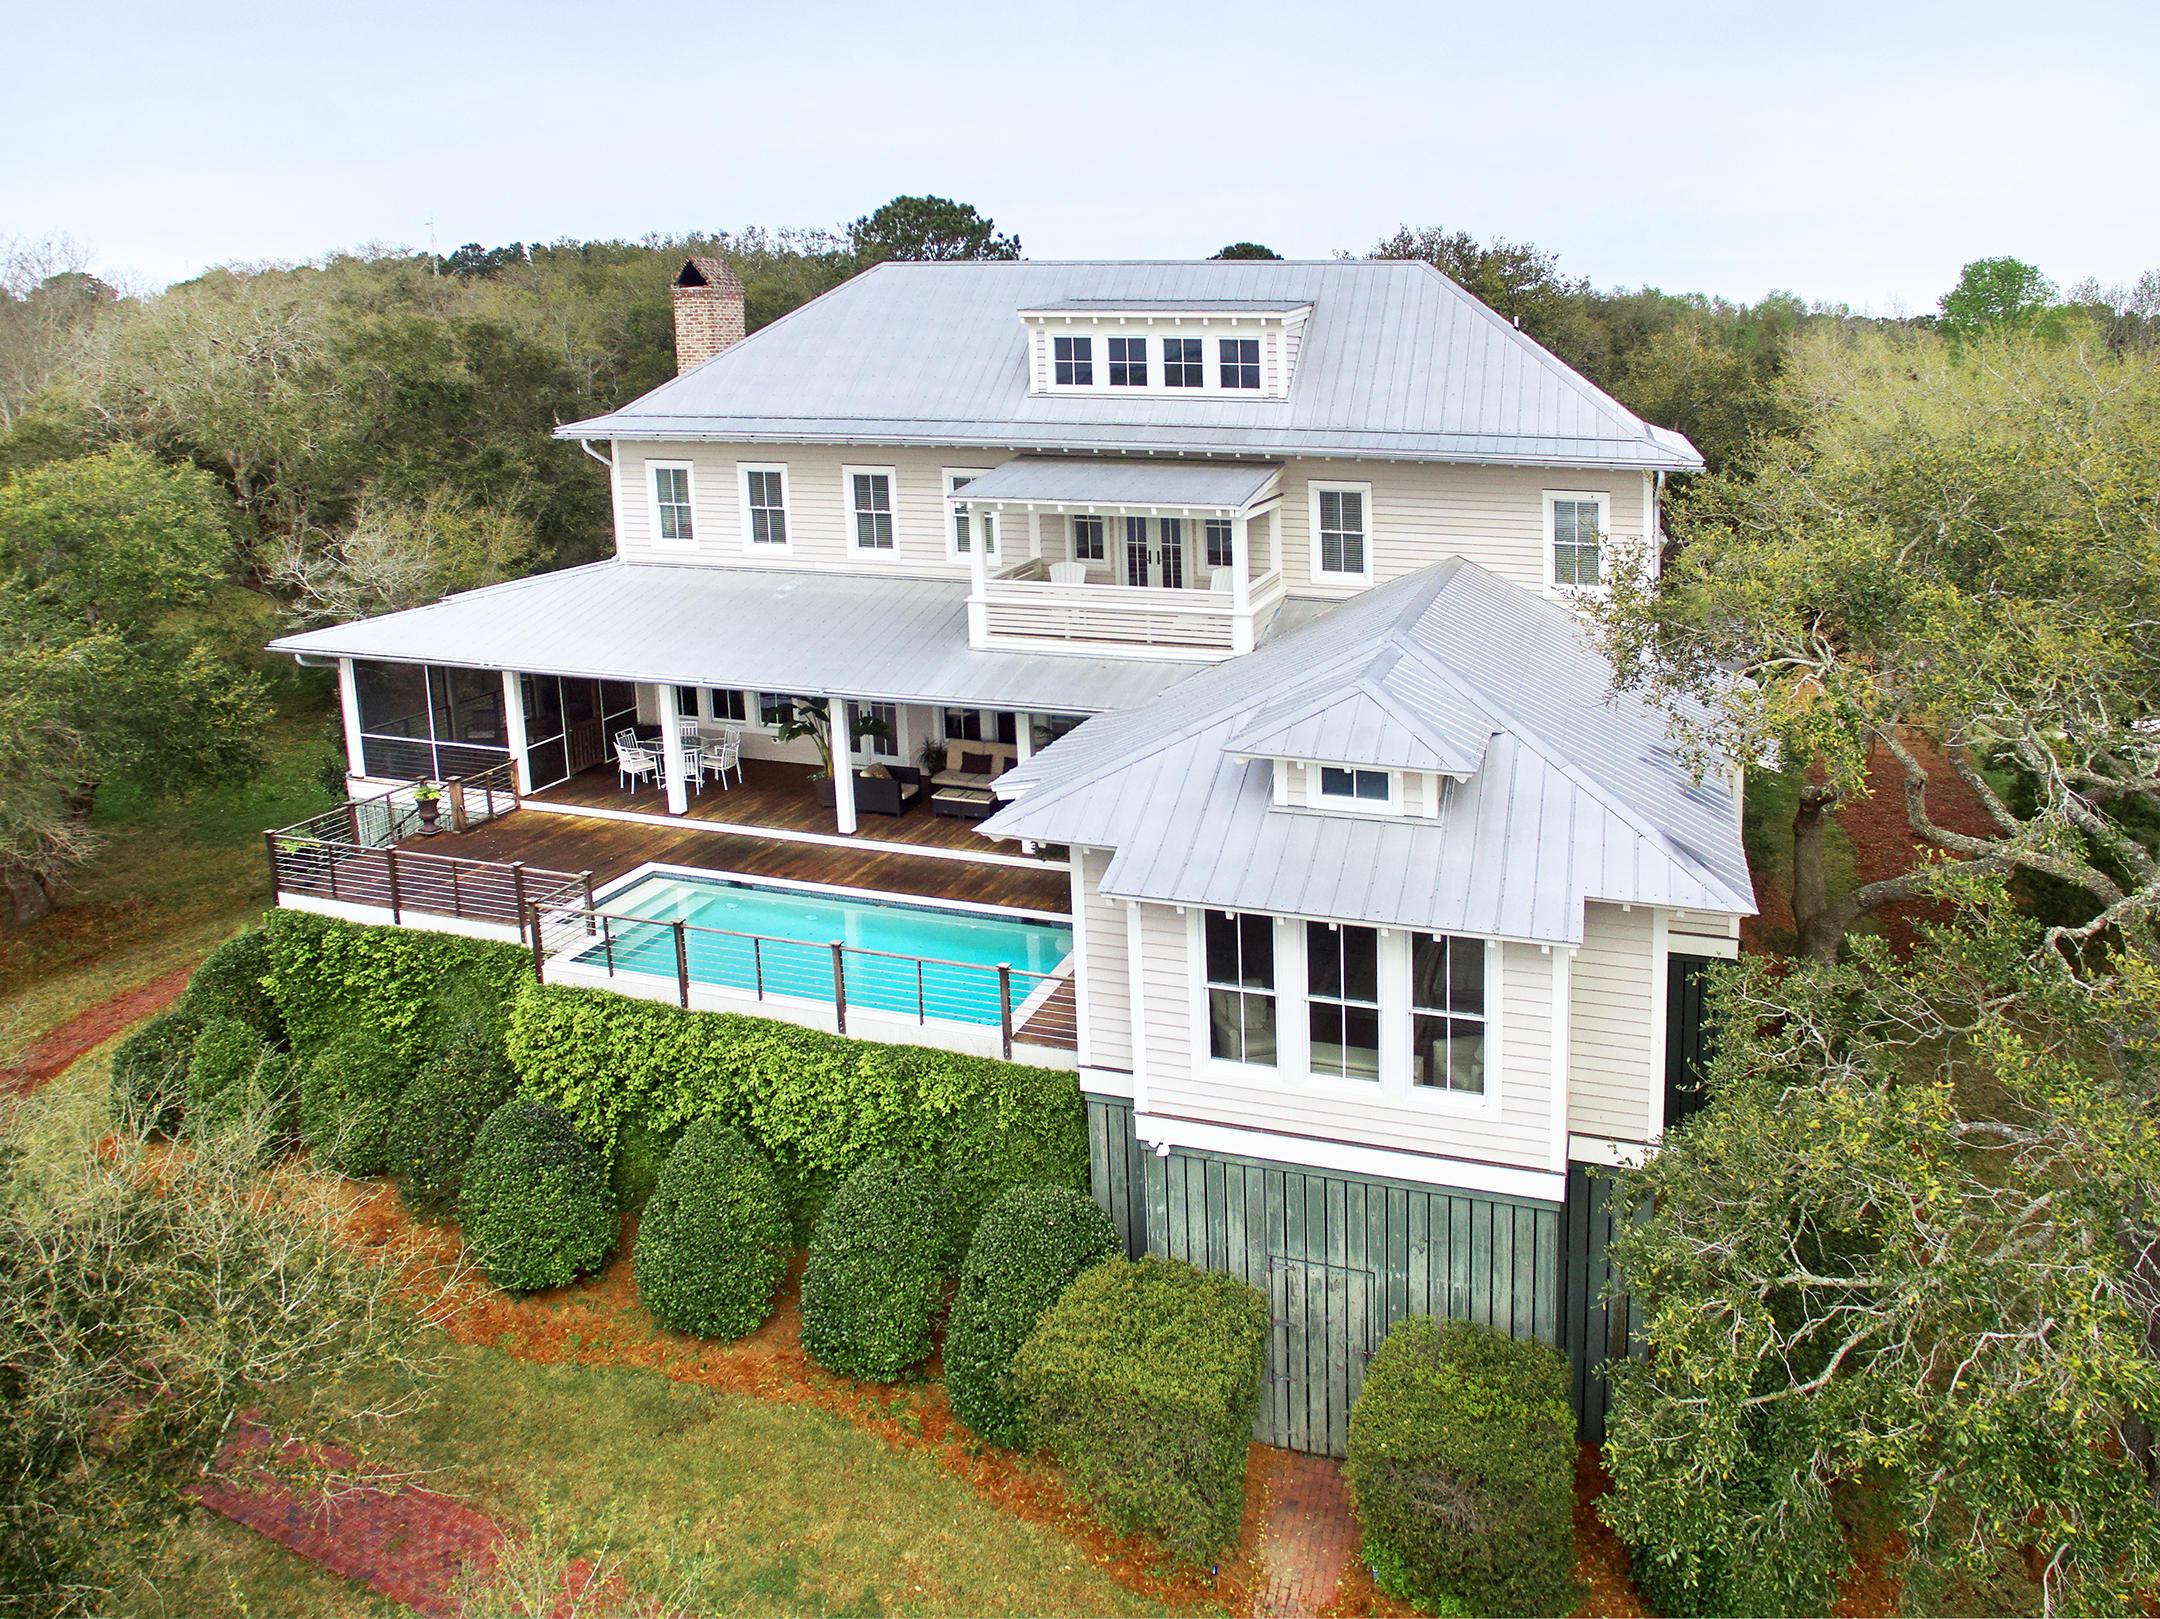 White Stalls Pt Jackson Homes For Sale - 625 Hall, Awendaw, SC - 47